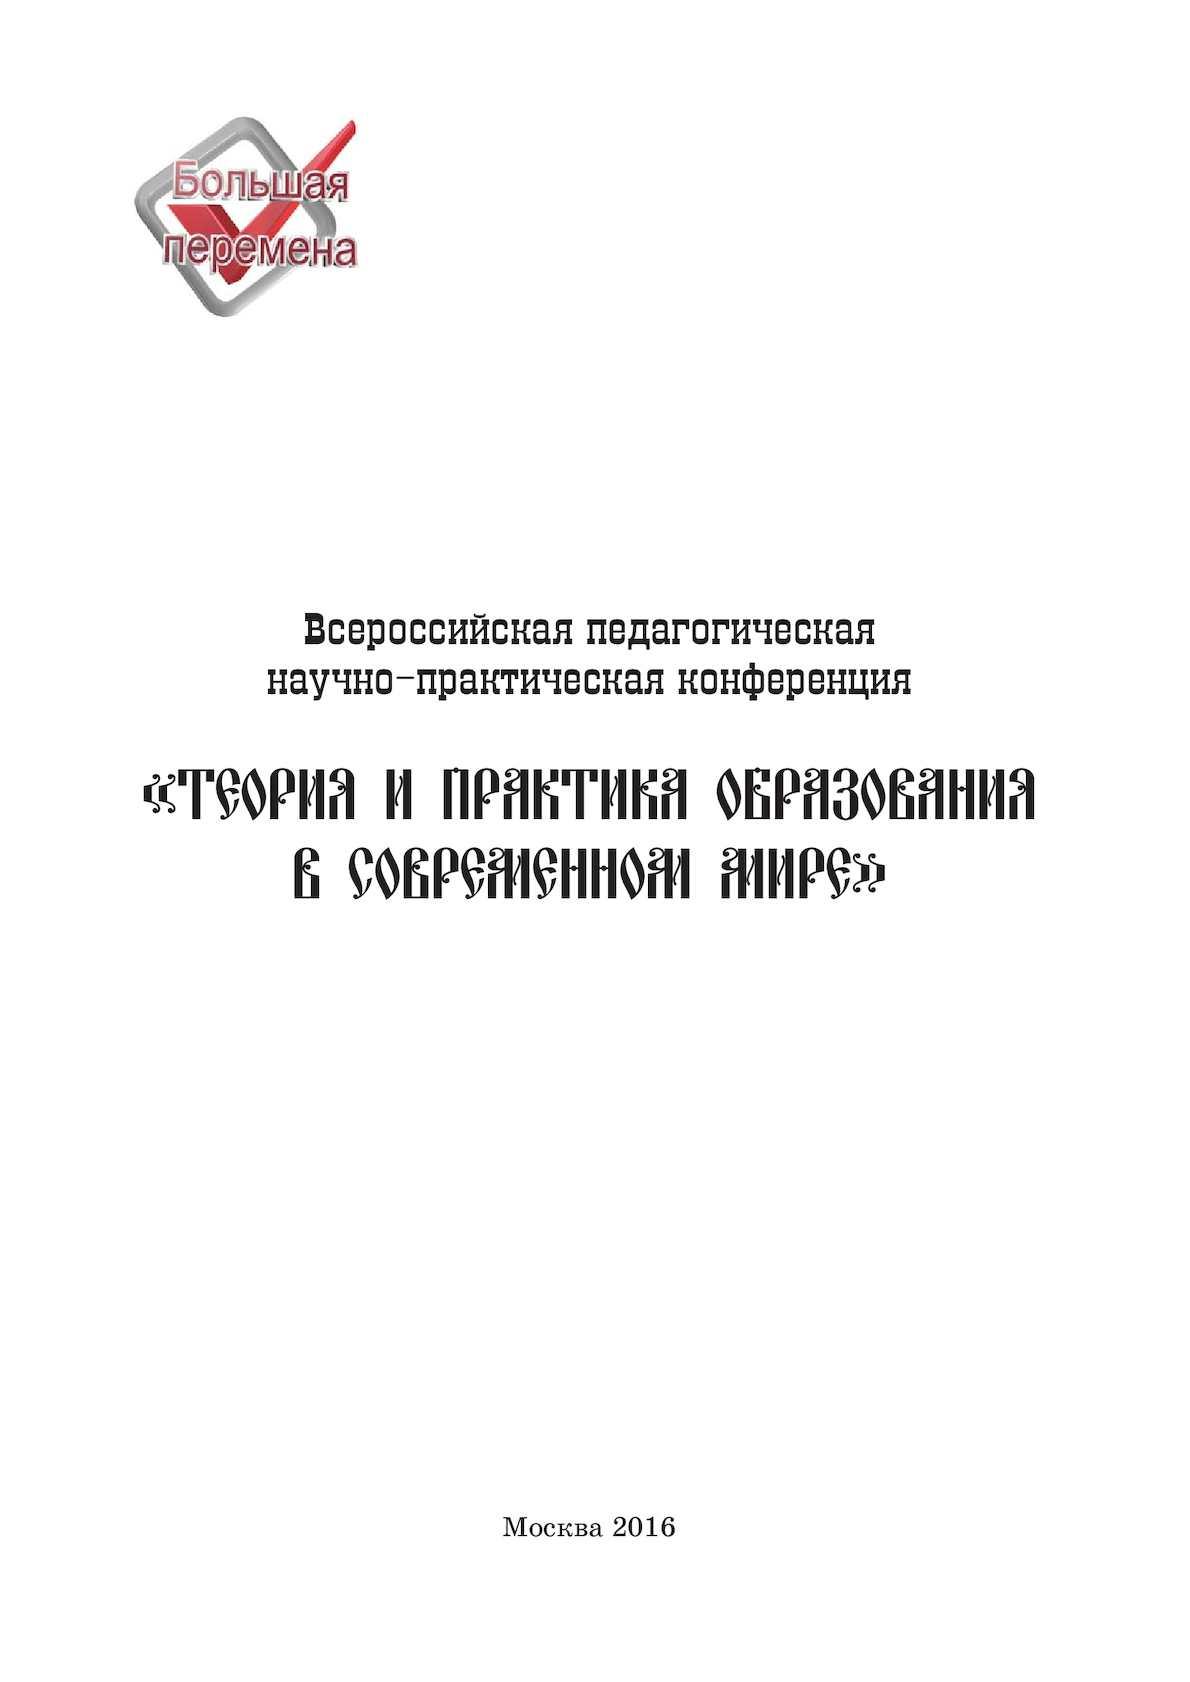 Calaméo - Теория и практика образования 2dfe019d859